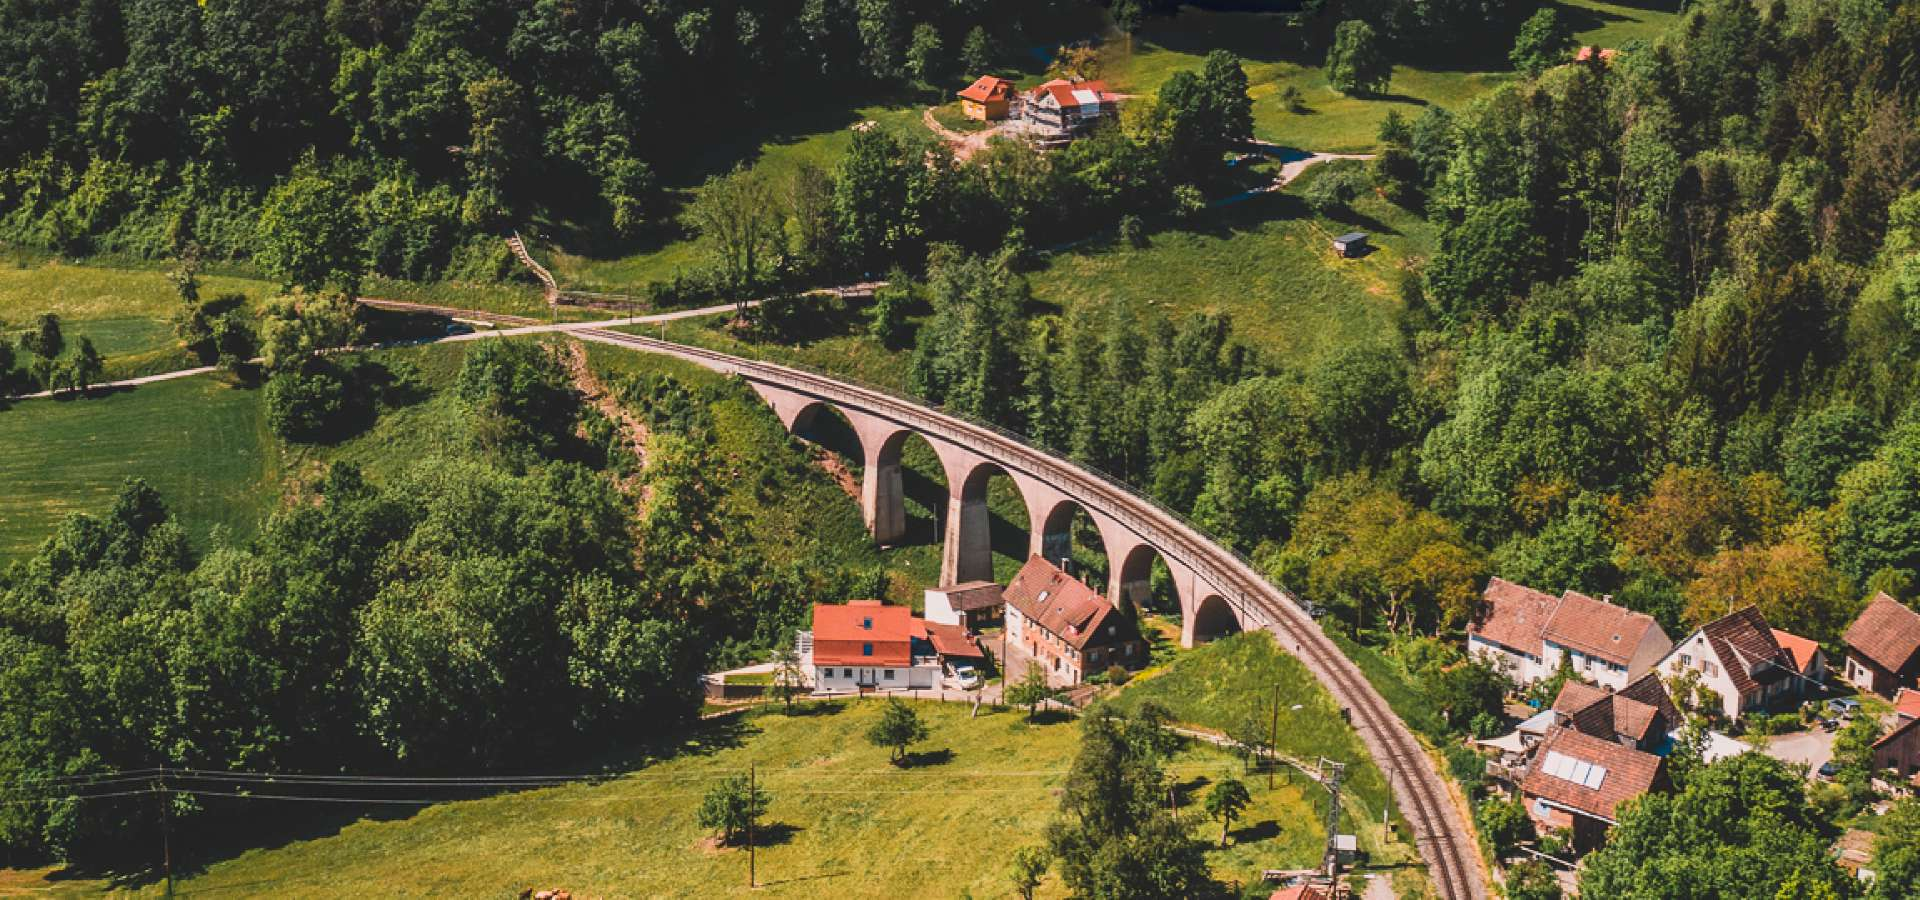 Viadukt - Lang